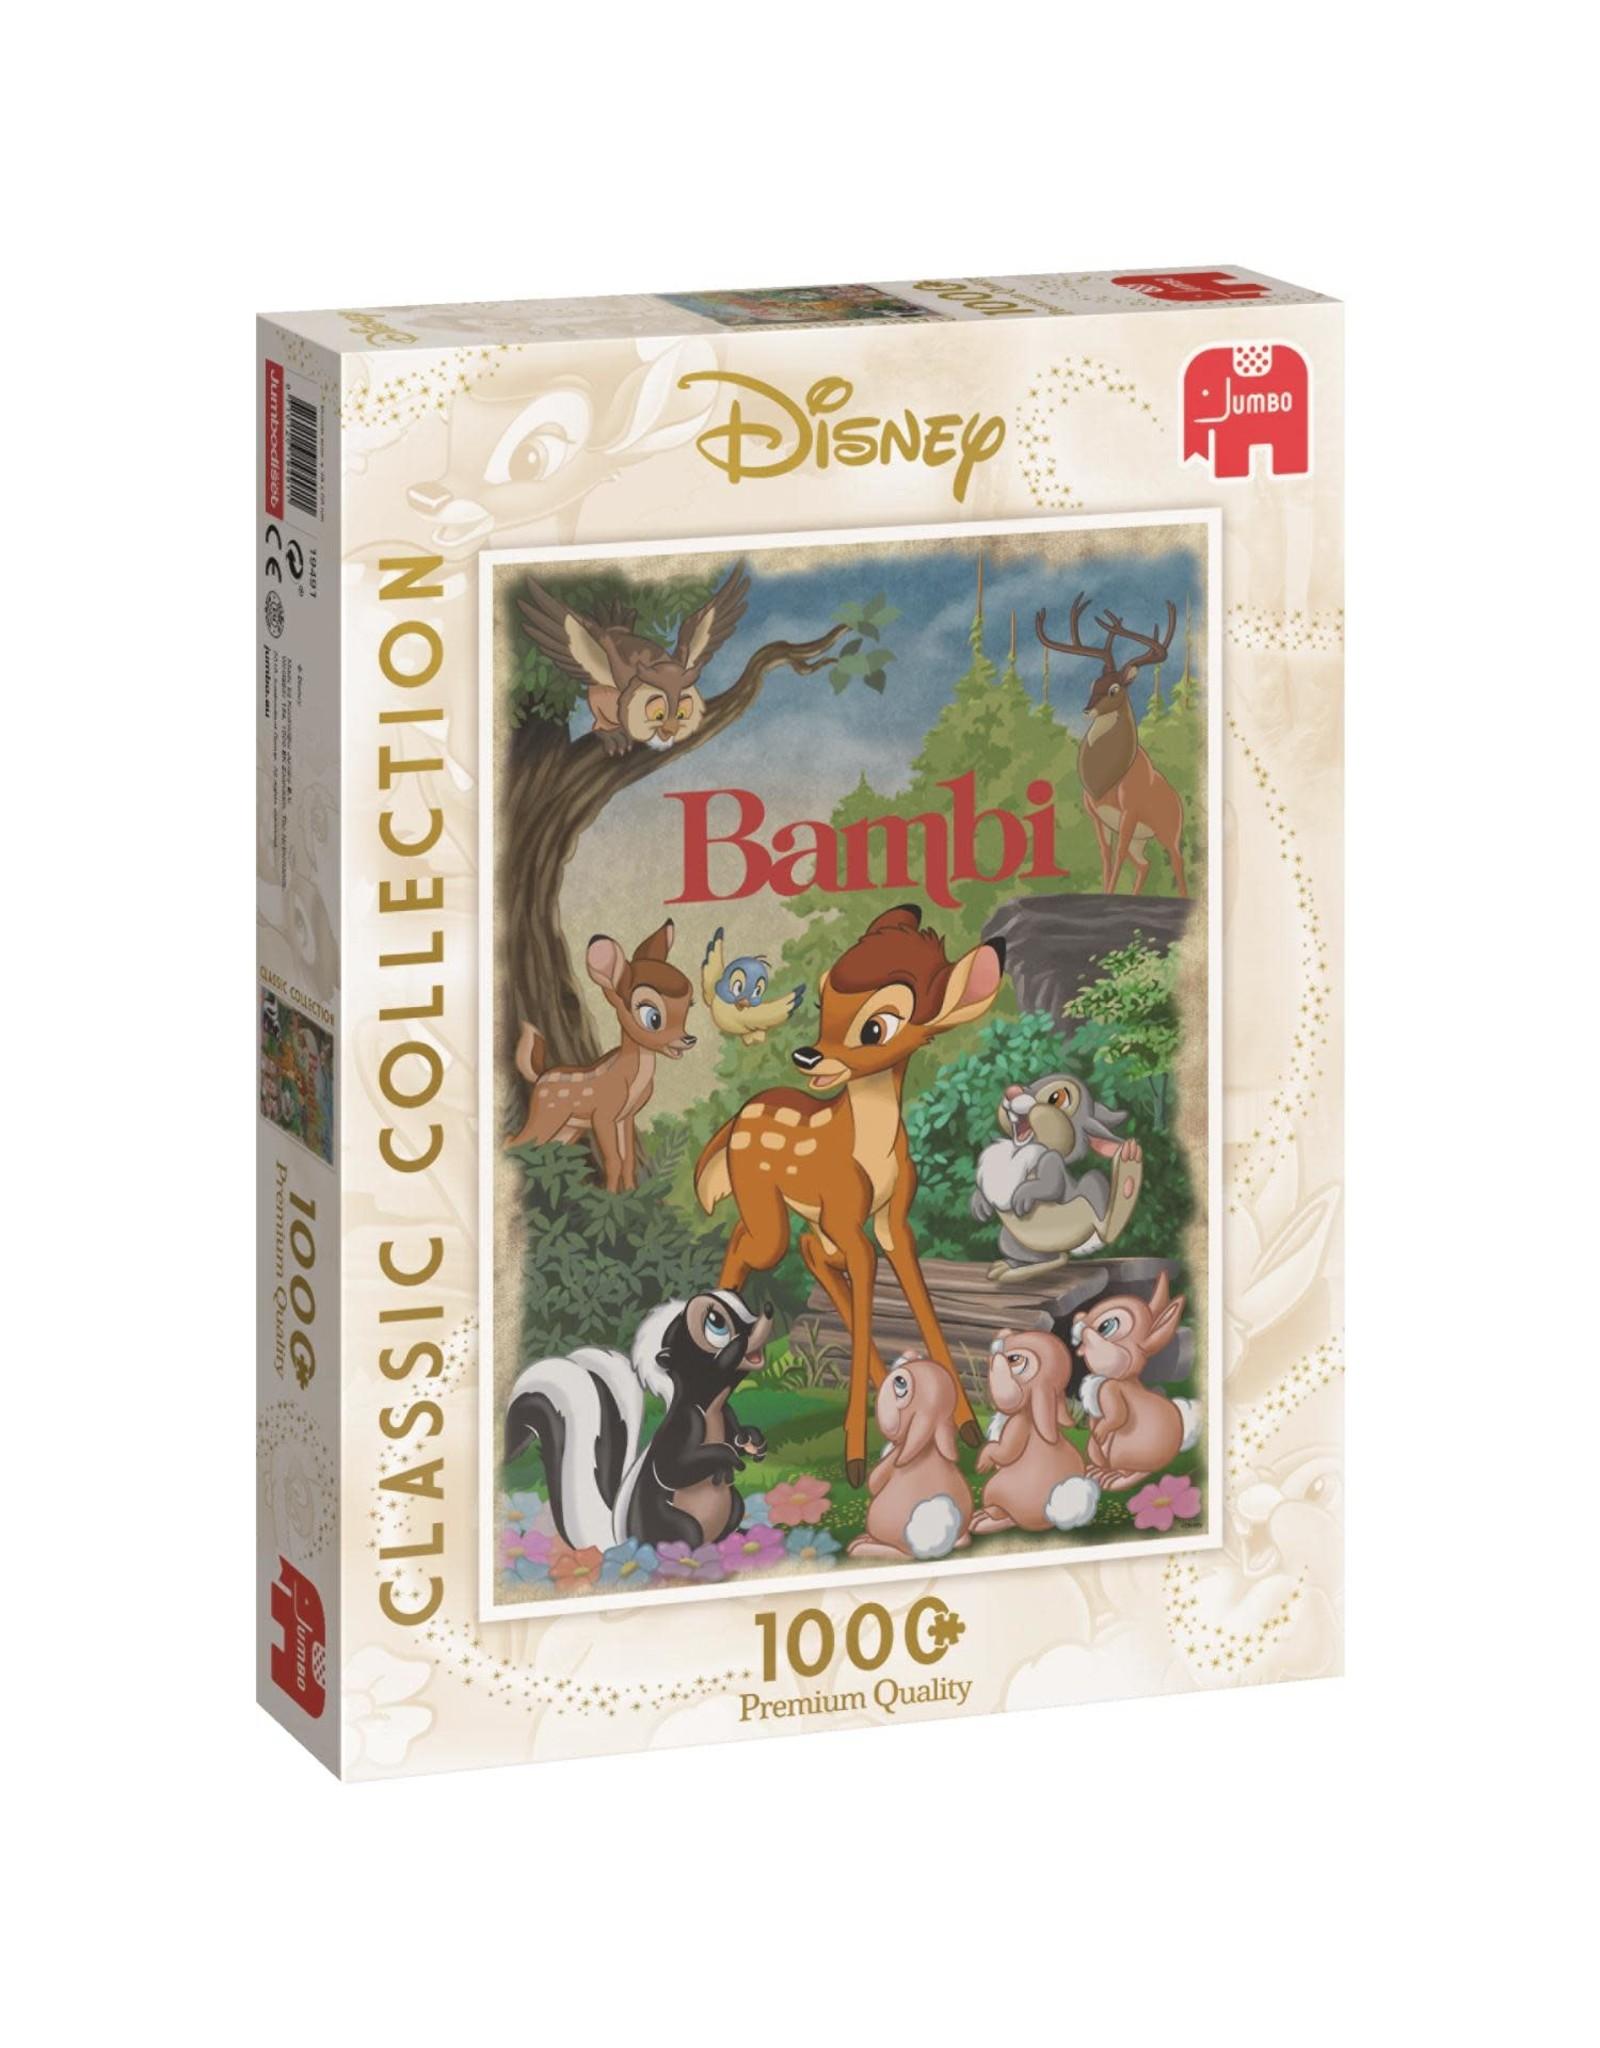 Jumbo DISNEY CLASSIC COLLECTION Puzzle 1000P - Bambi